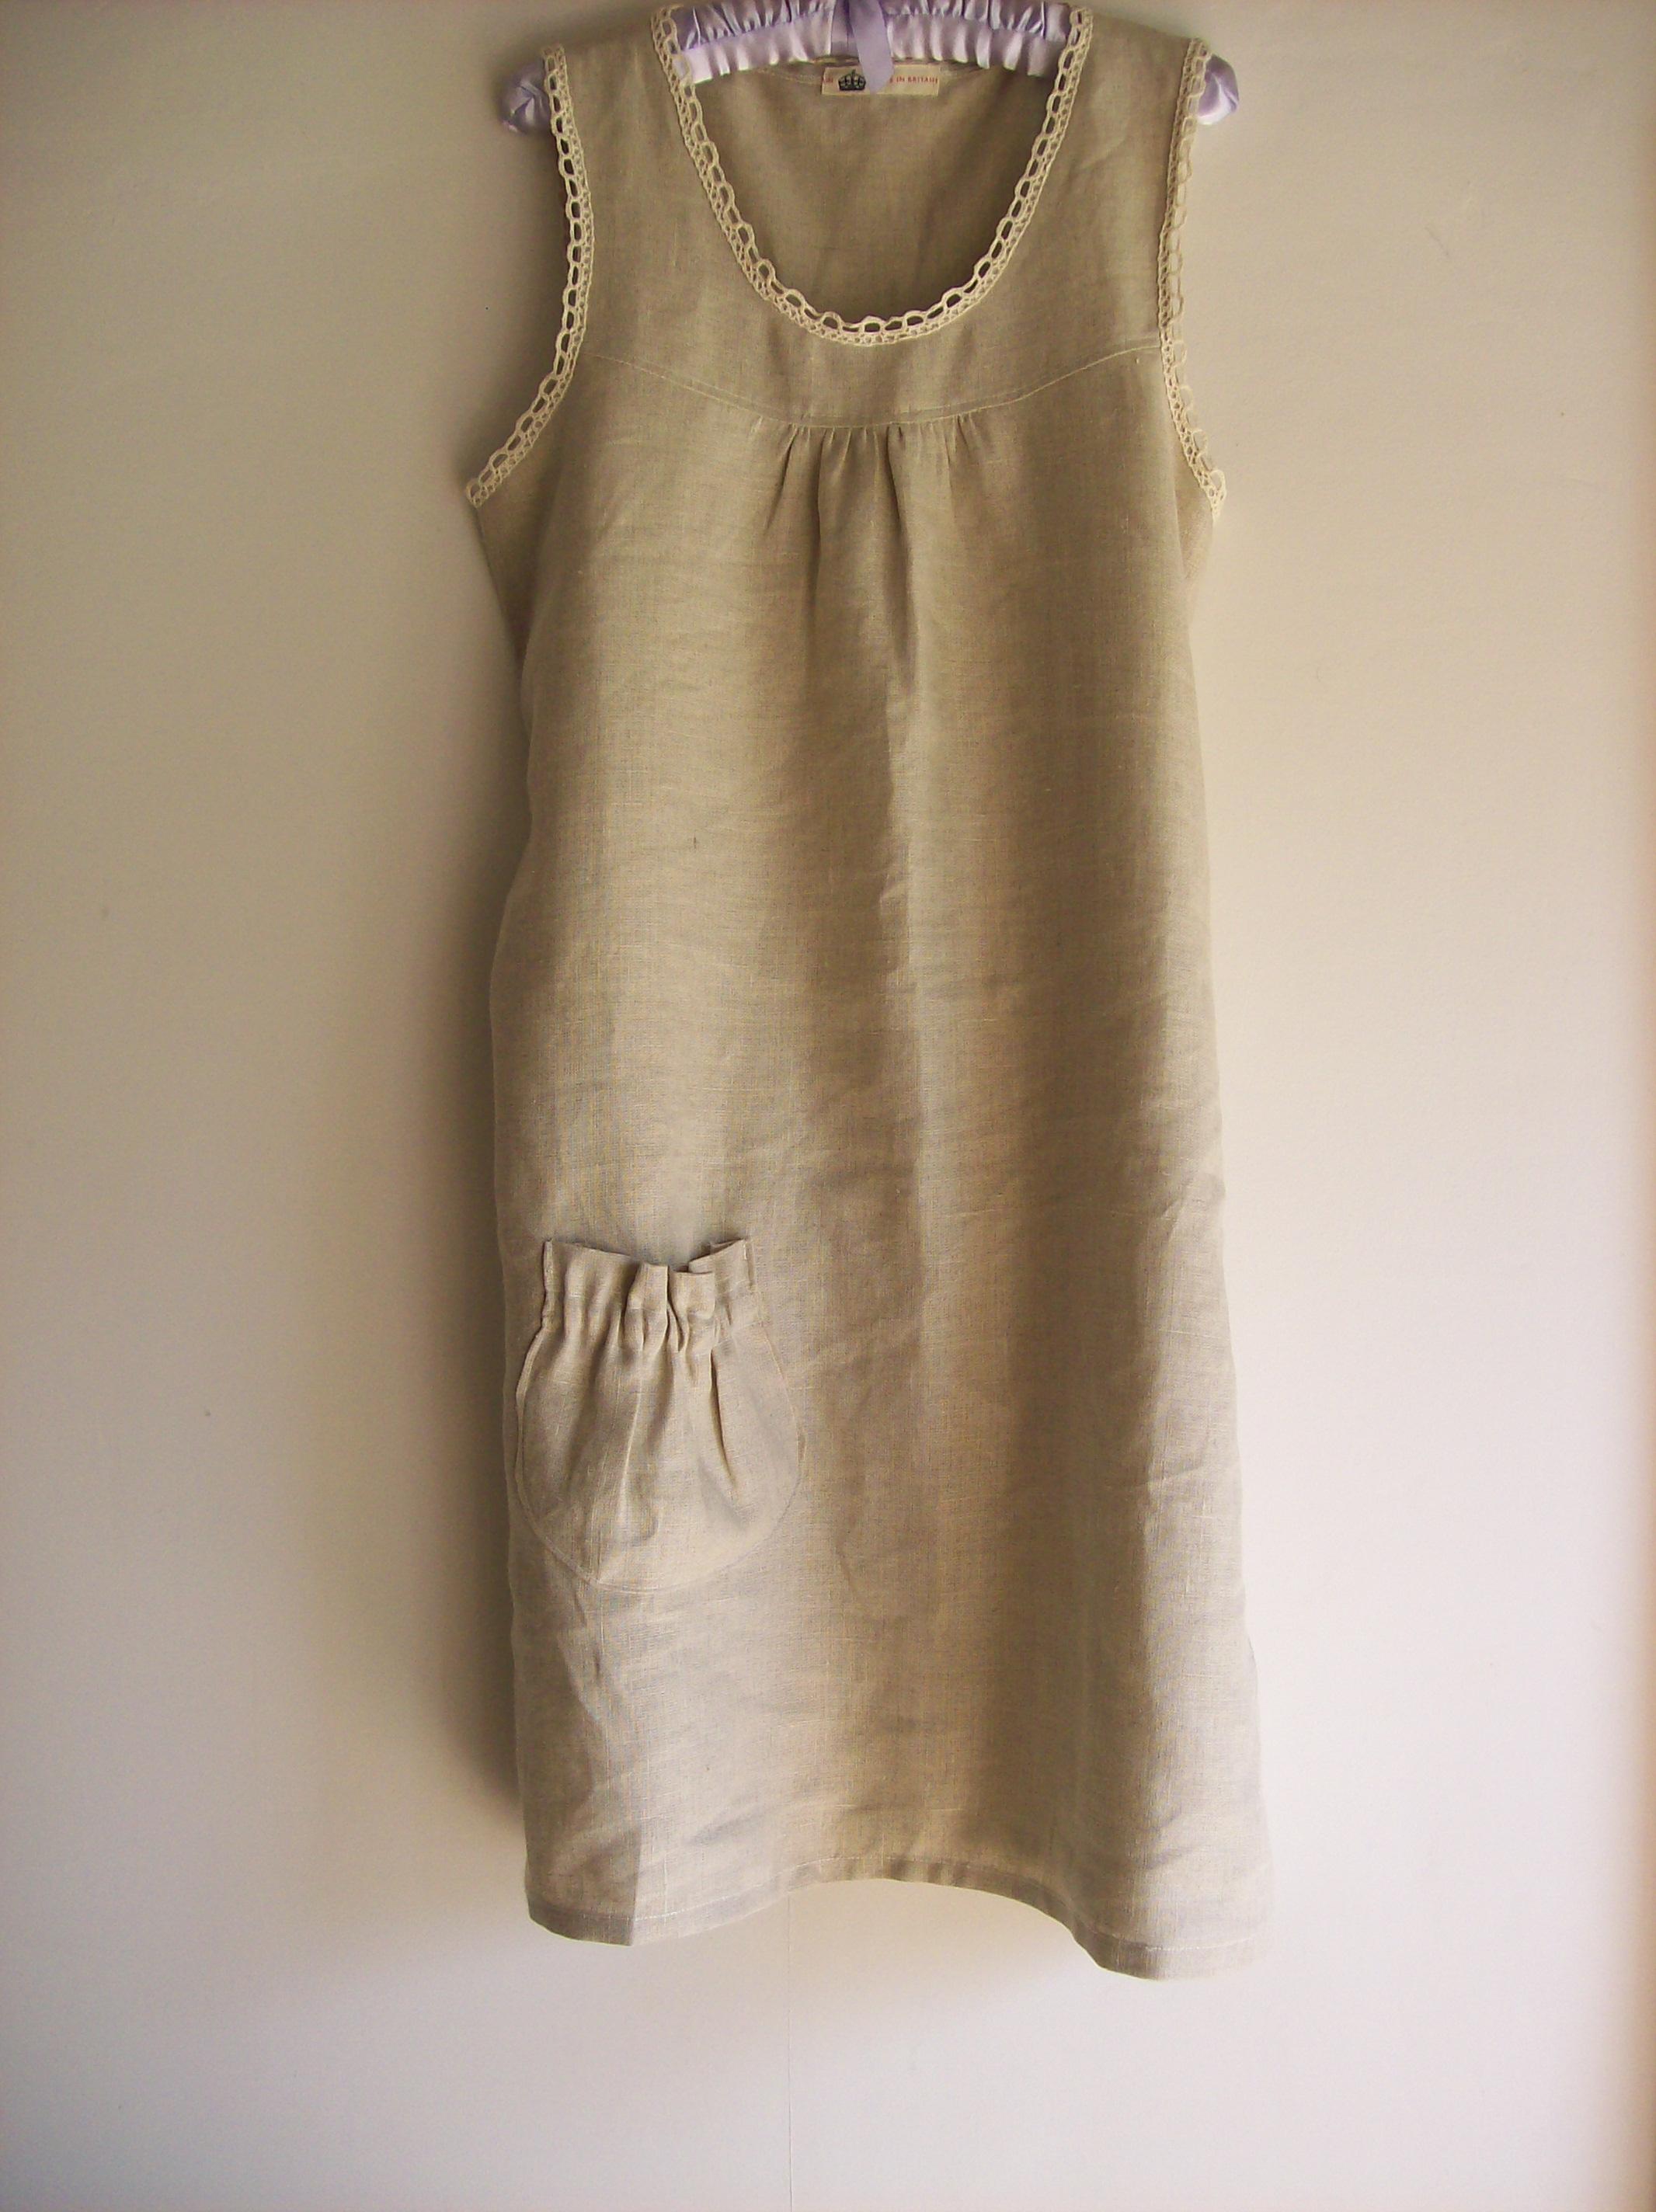 Oatmeal Linen Shift Dress